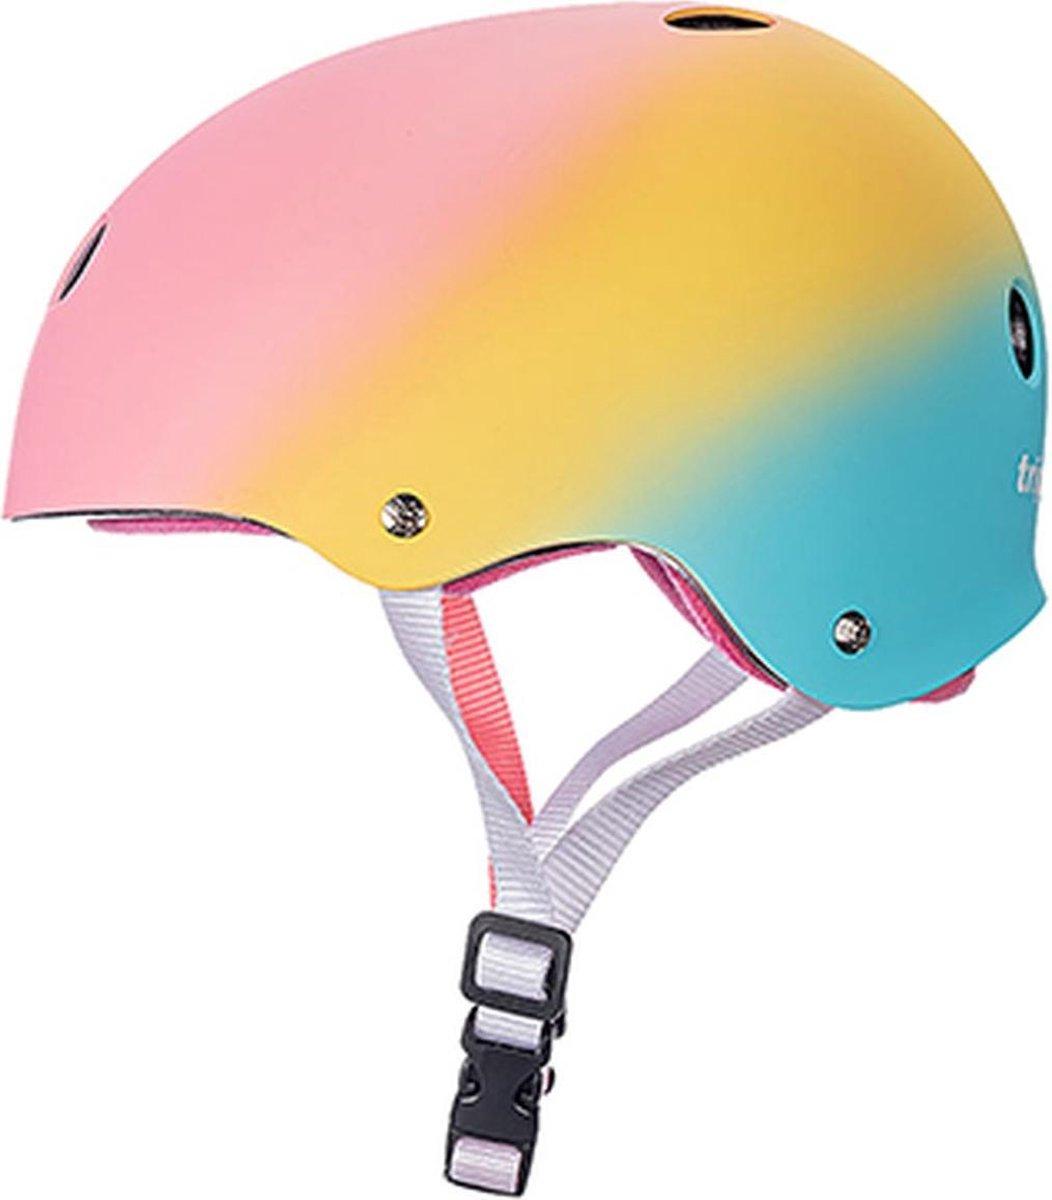 The Certified Sweatsaver Helmet Shaved Ice XS/S